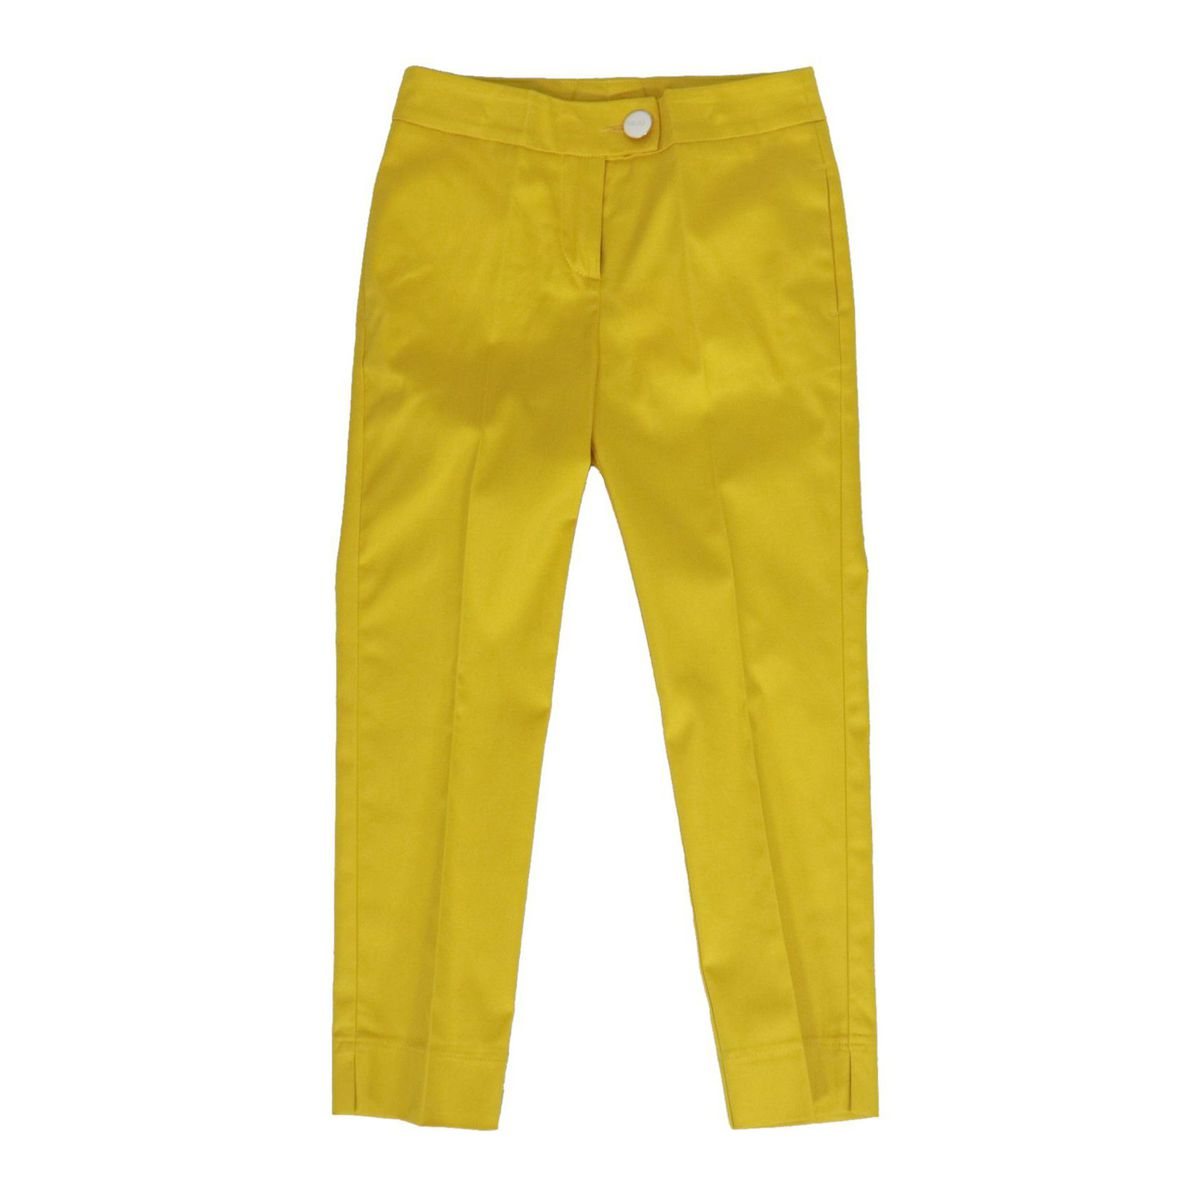 Stretch cotton cigarette trousers Yellow Liu Jo